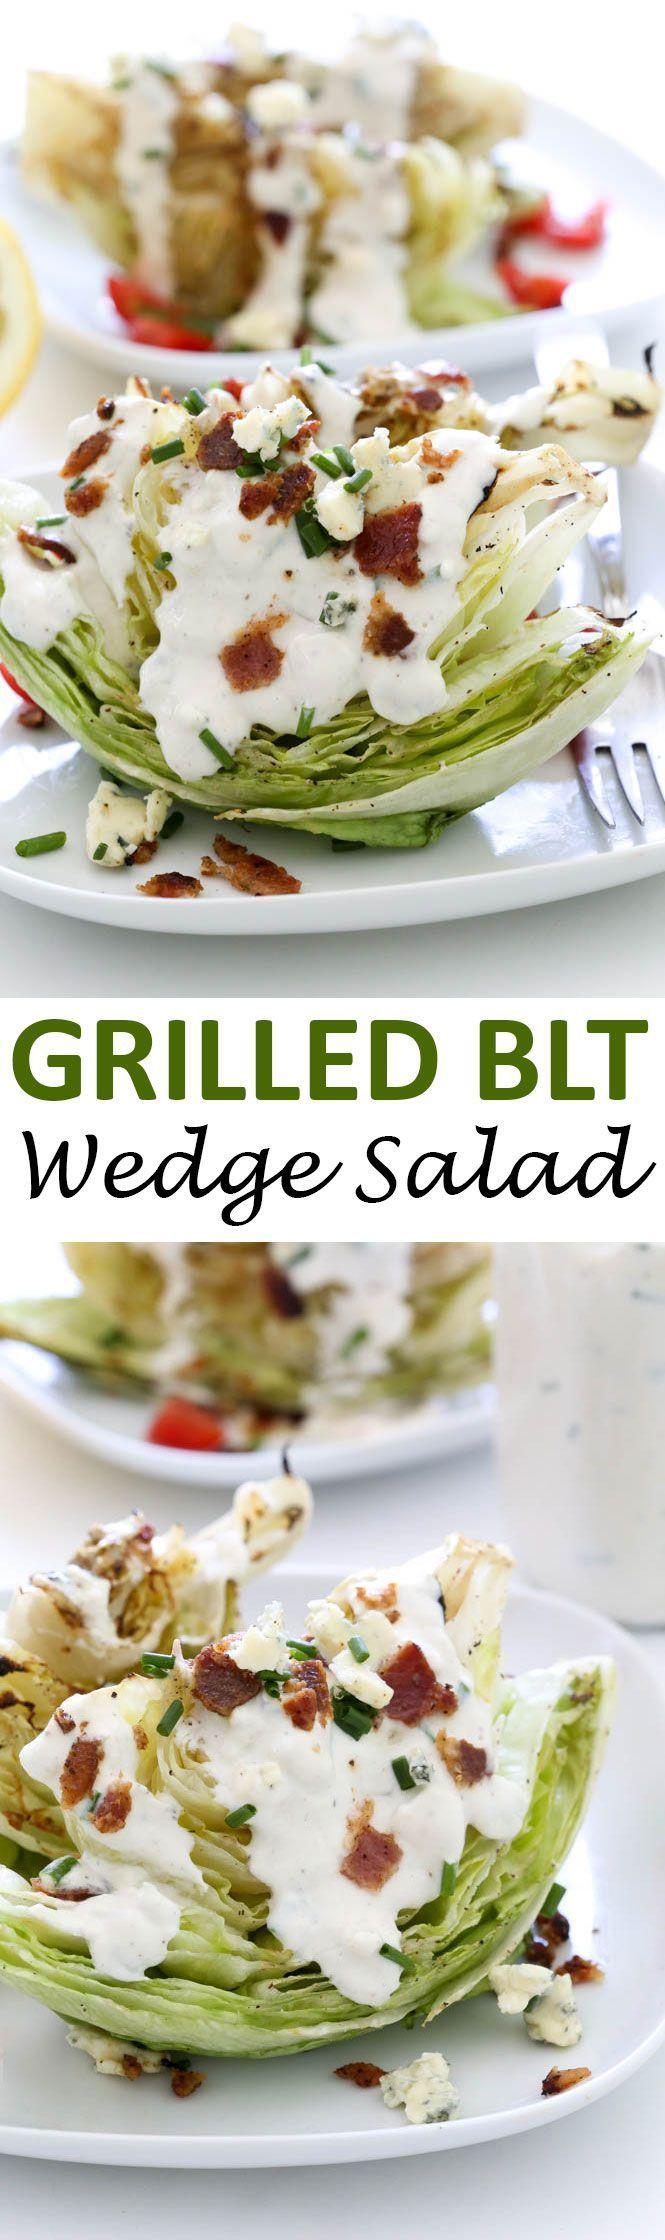 ... salad salad grilled salad grilled chicken salad blt grilled romaine